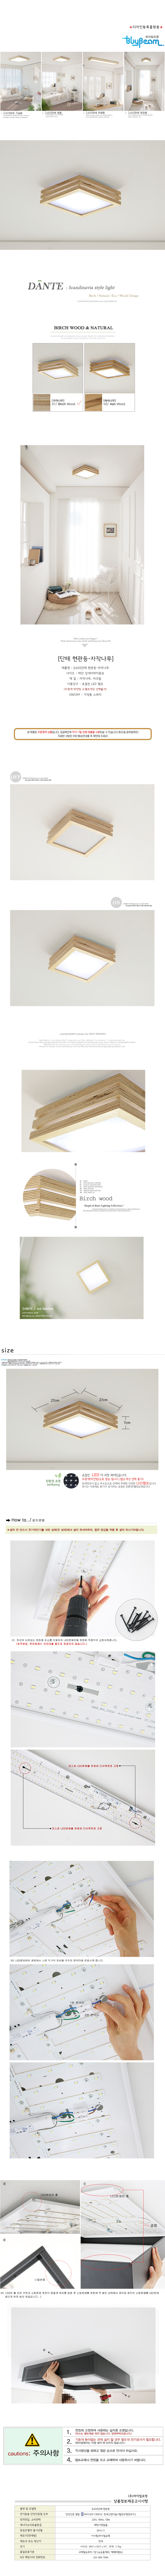 LED 단테 현관등-자작나무 - 바이빔, 91,200원, 리빙조명, 방등/천장등